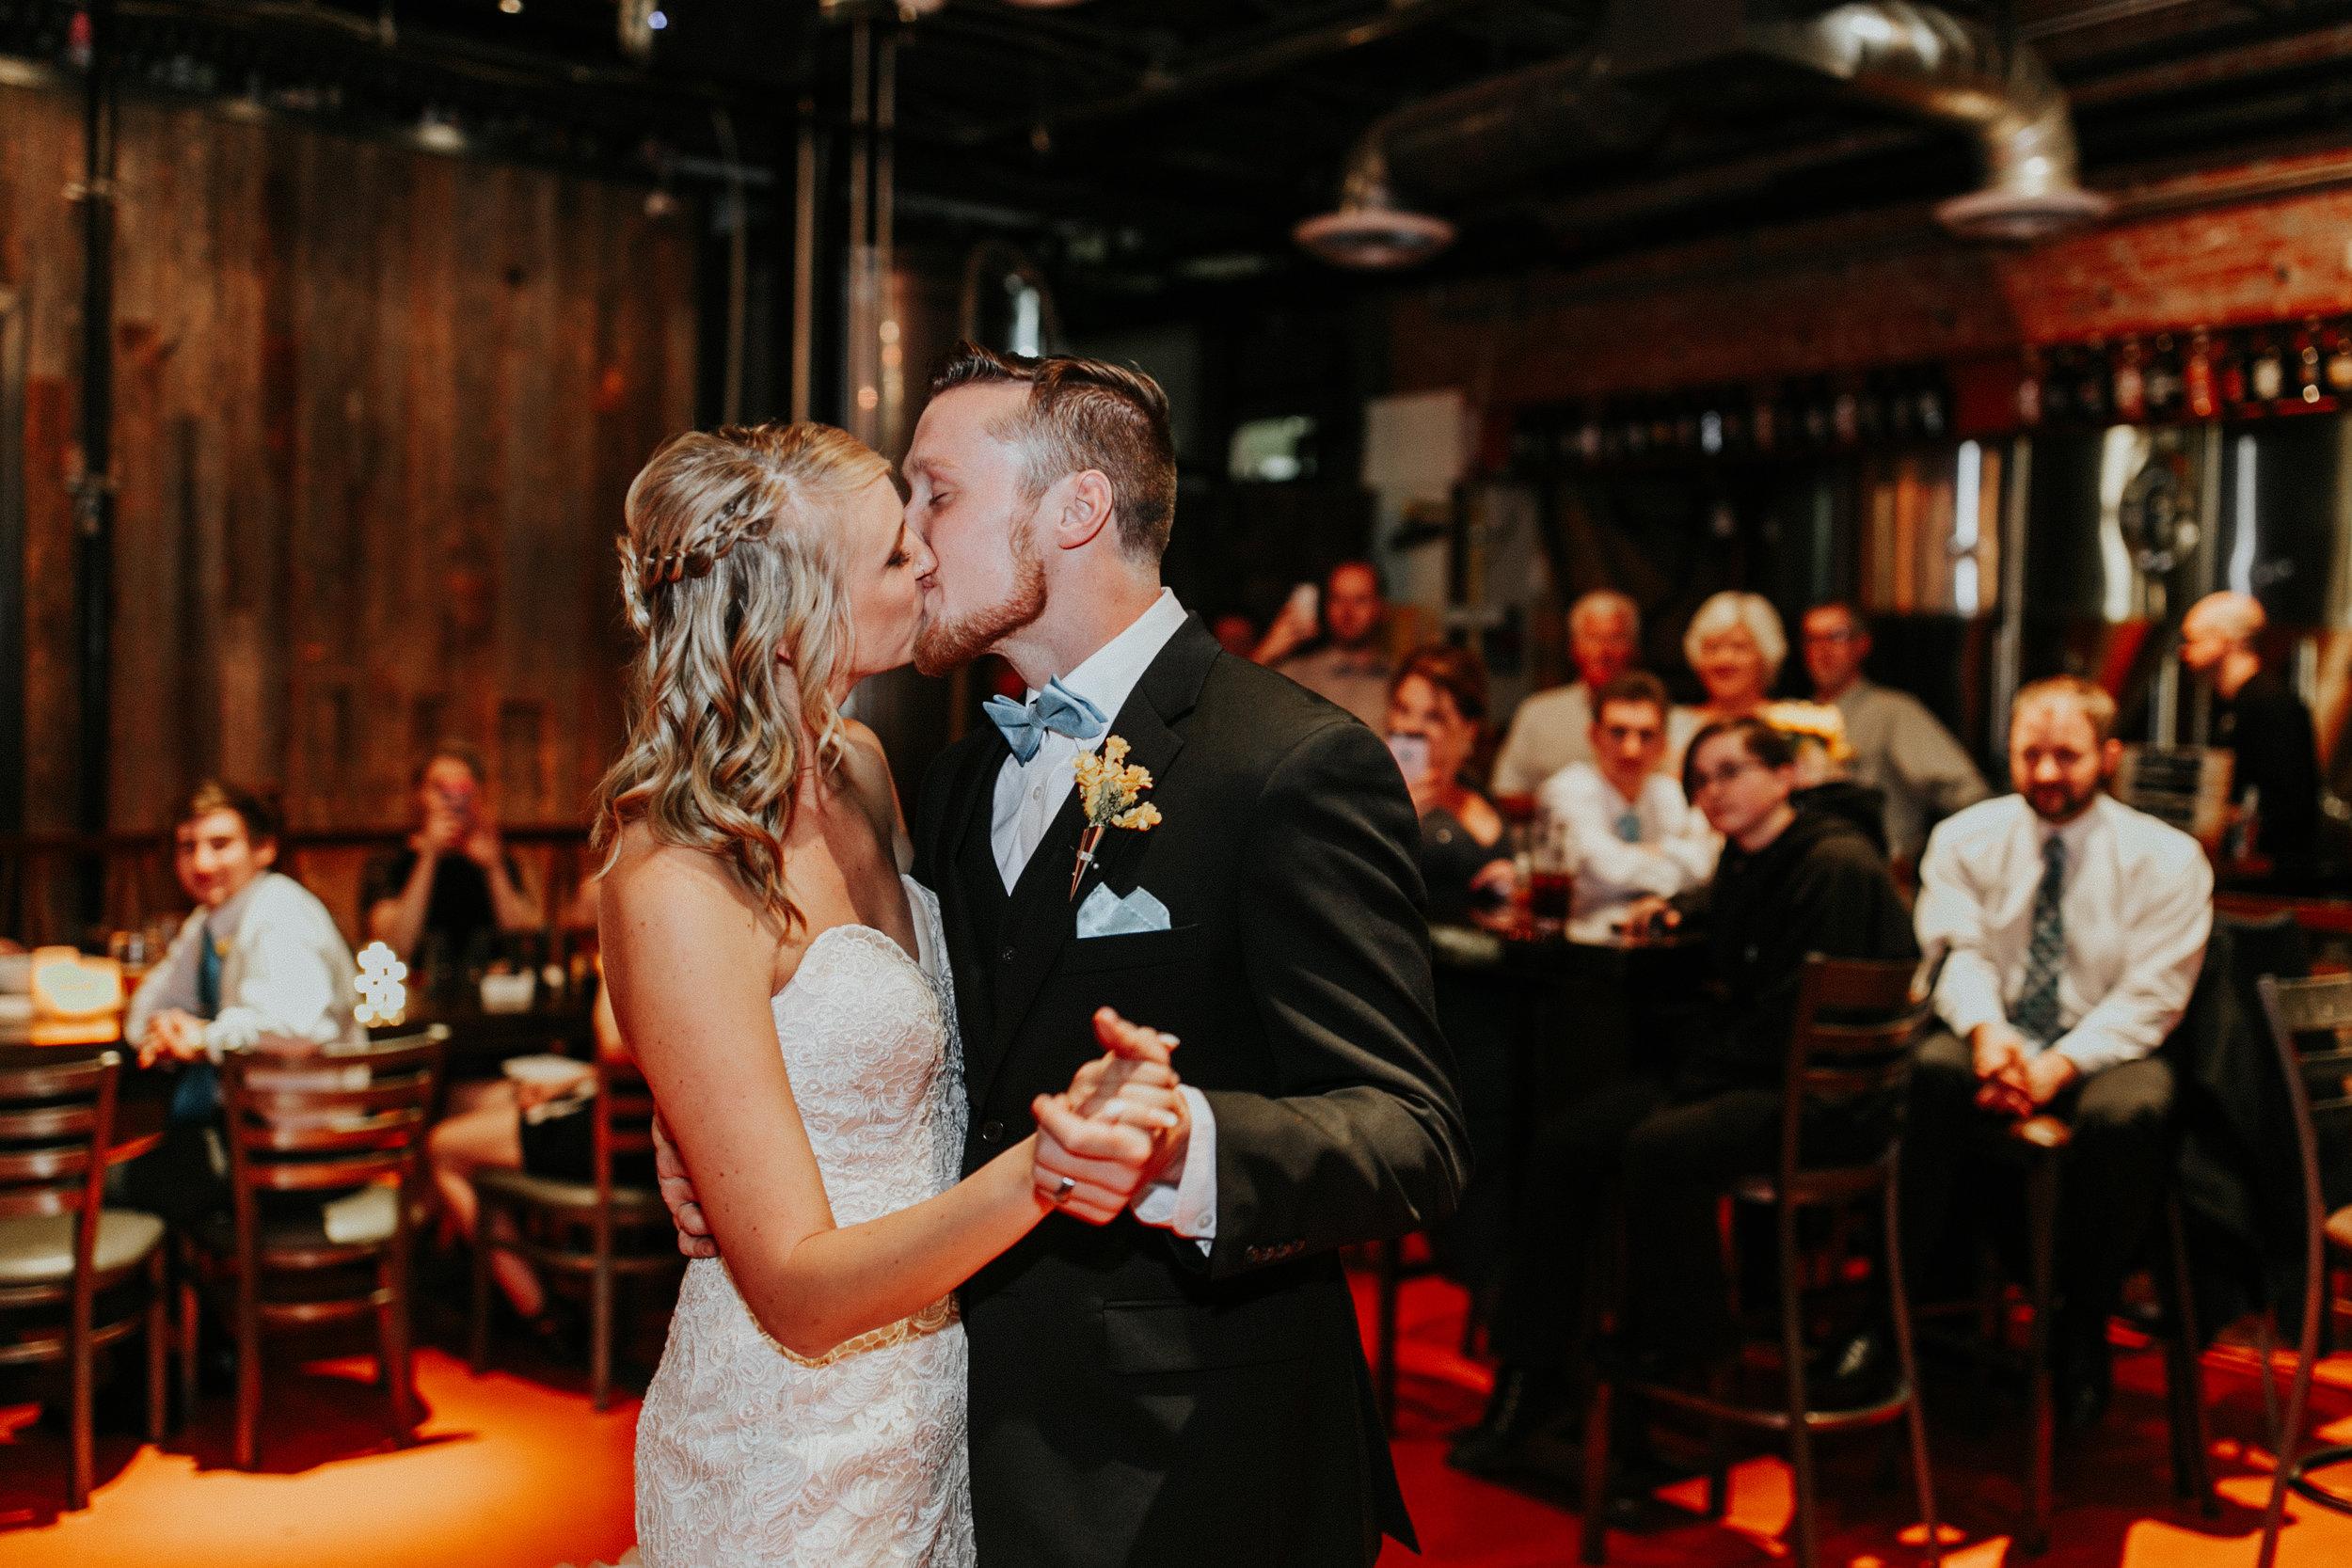 adventure-wedding-photographer-gracetphotography-55.jpg